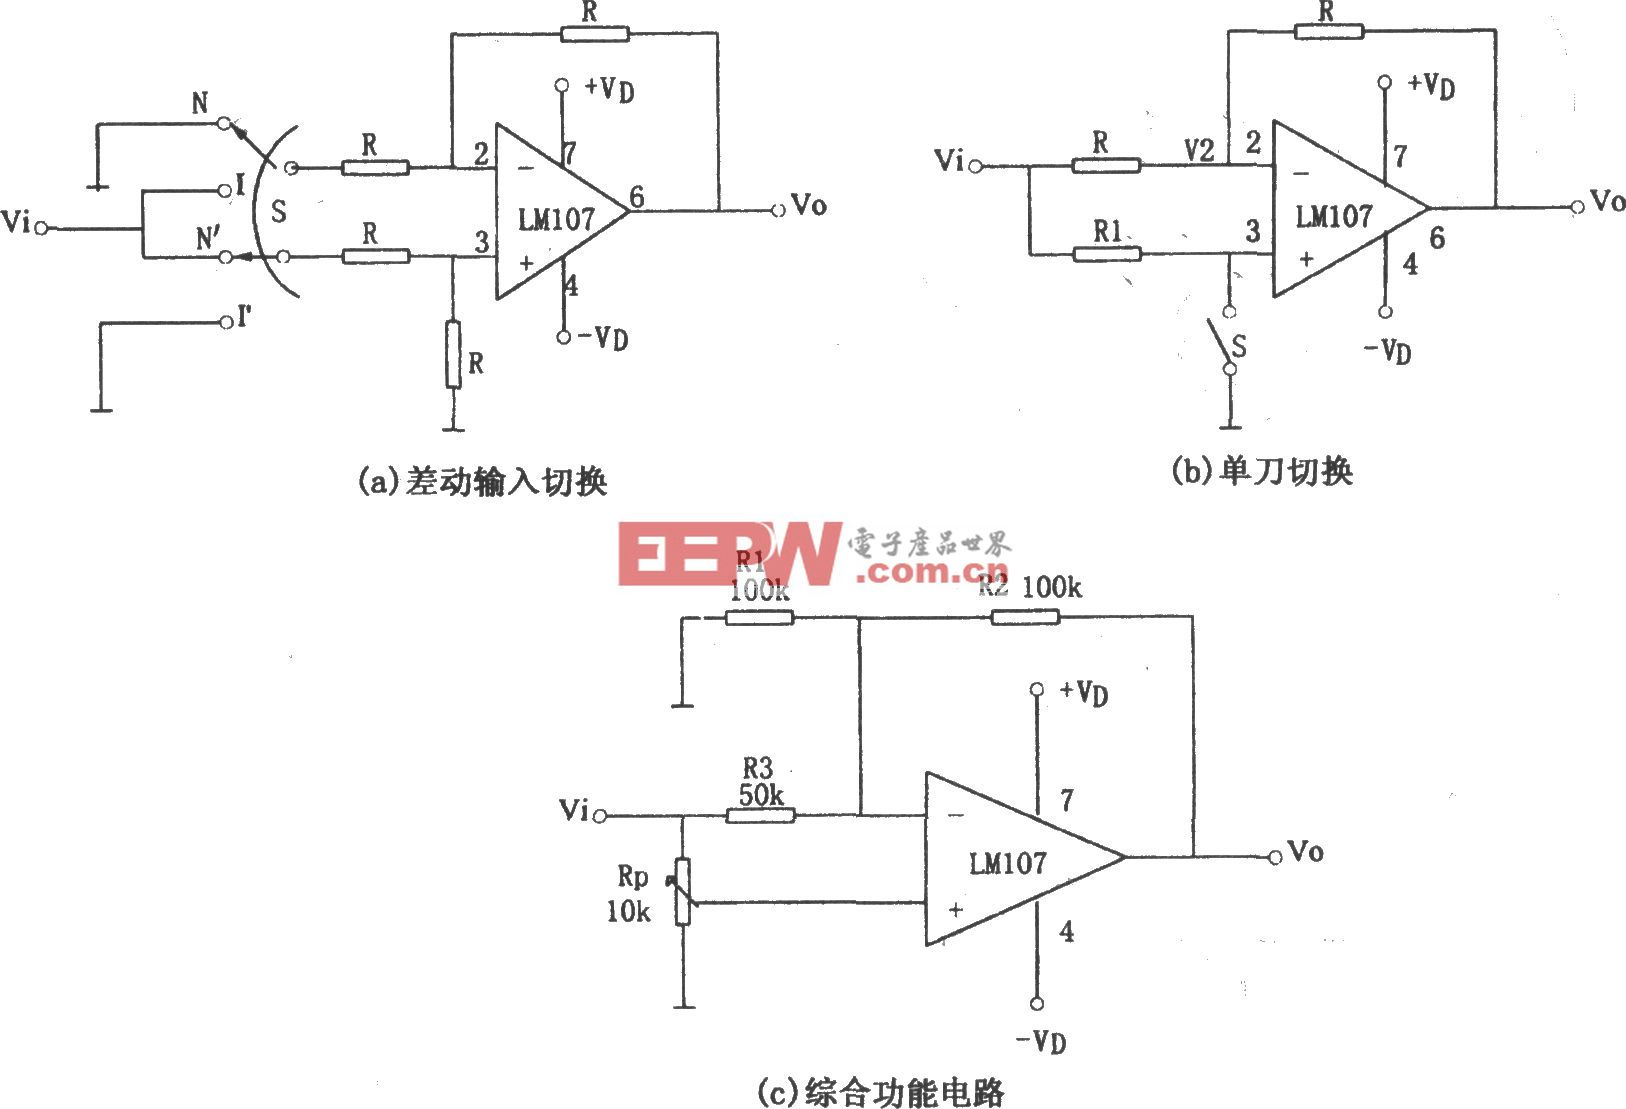 LM107构成的增益正负值可线性调整的放大电路